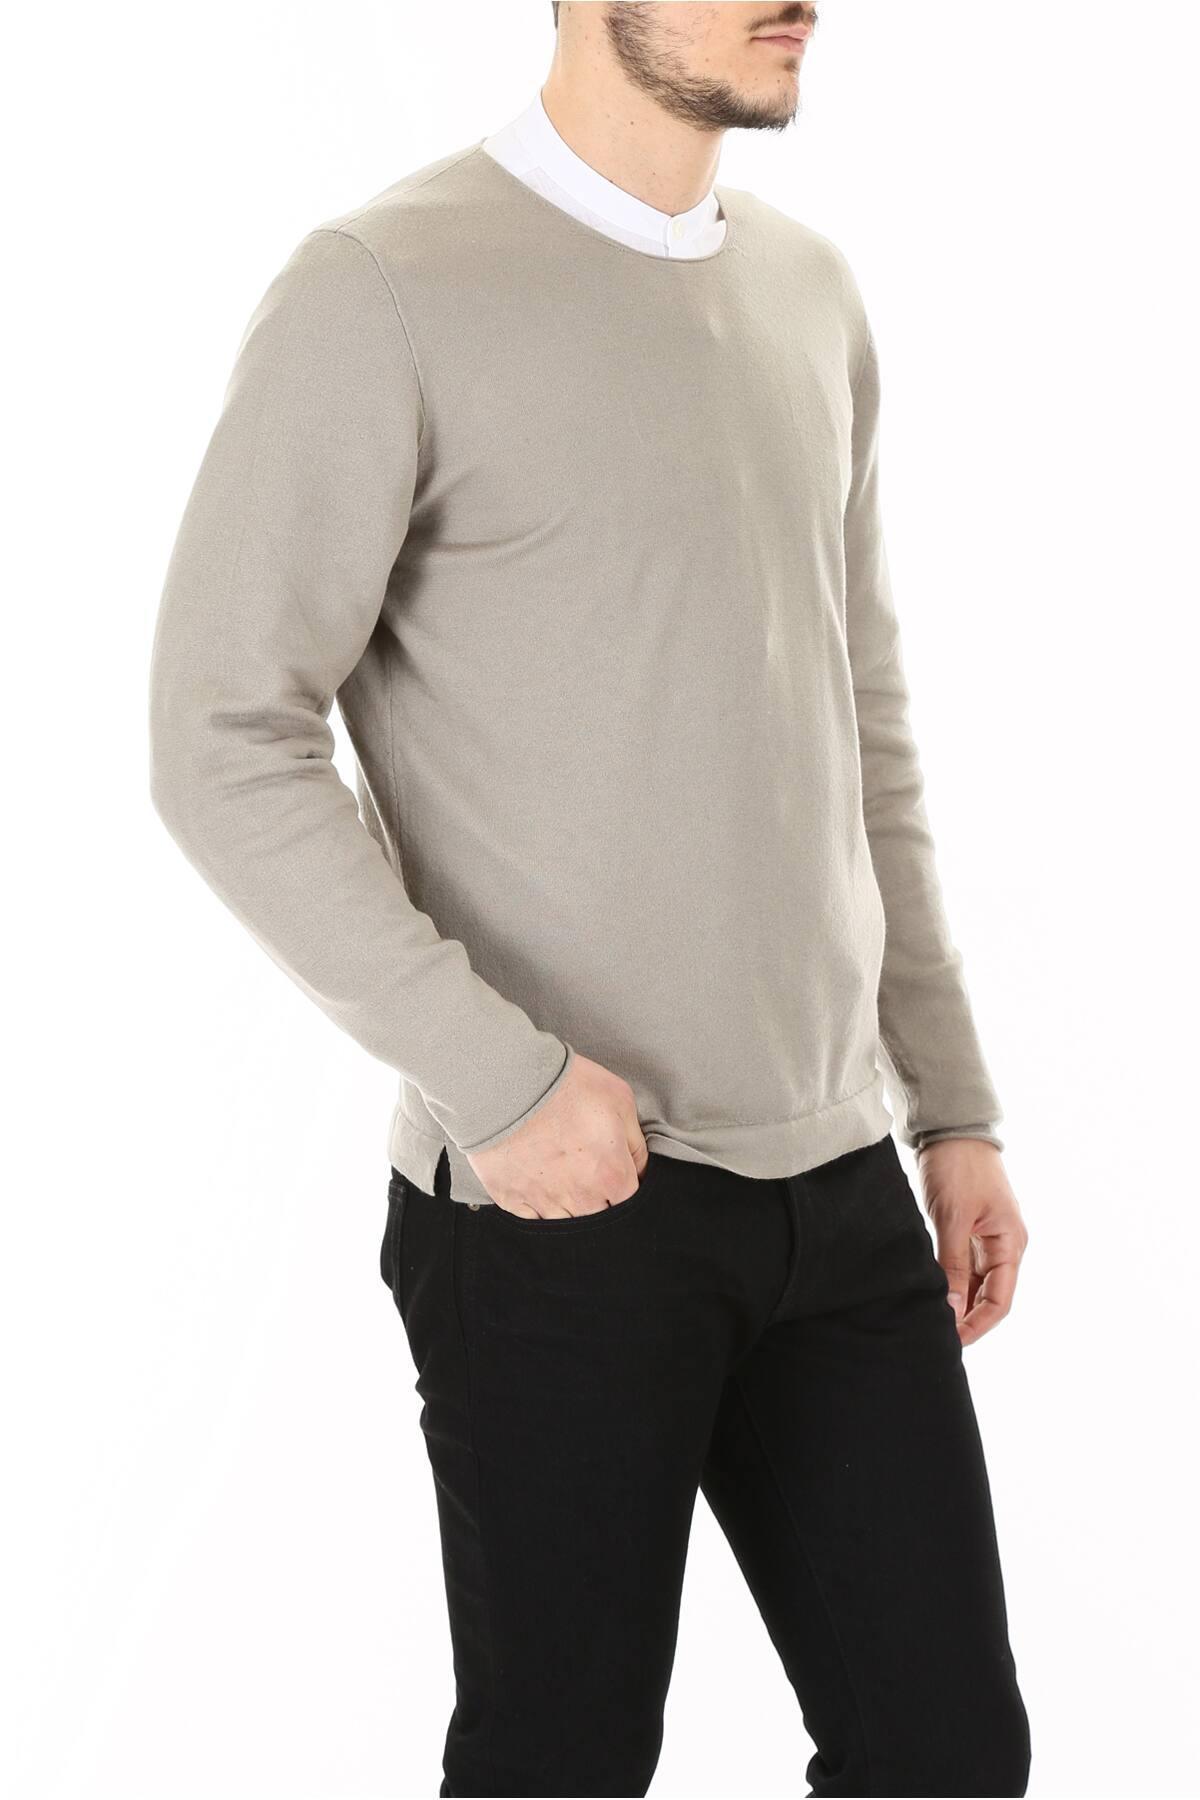 Massimo Alba Cashmere Pull in Beige,Grey (Grey) for Men